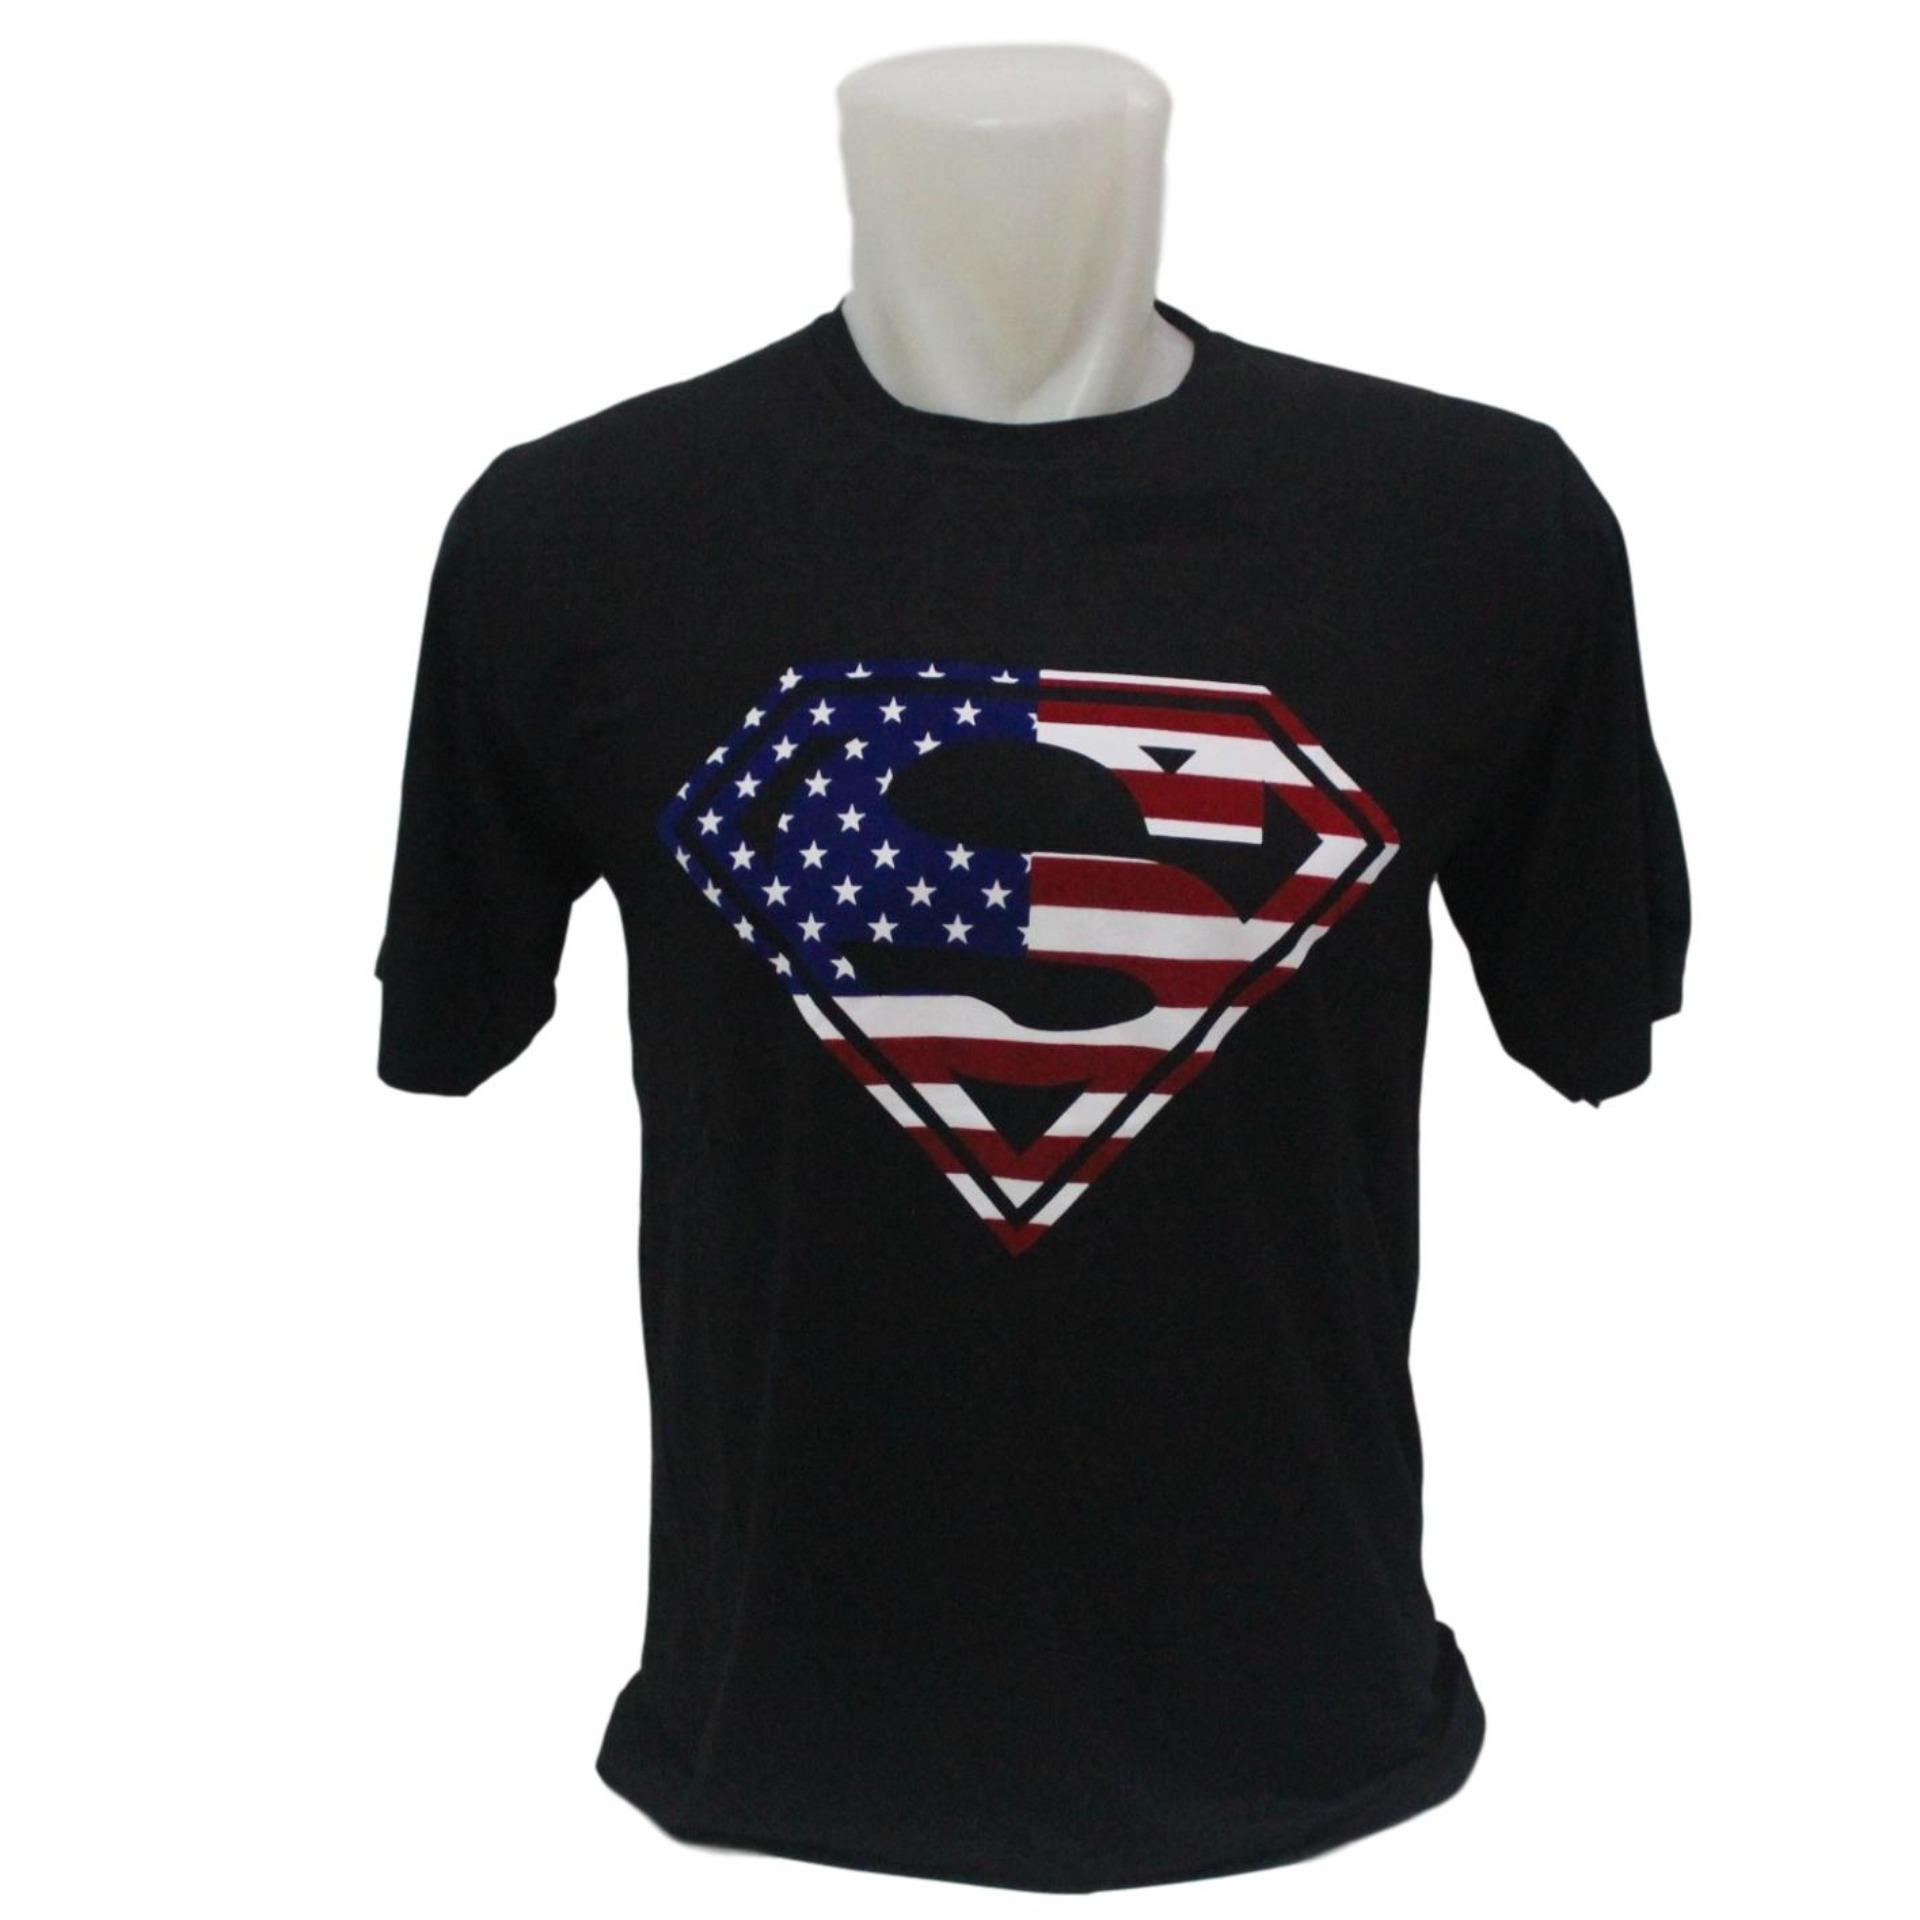 Vrichel - Kaos / Tshirt / Distro / Atasan / Kaos Distro Logo Superman USA